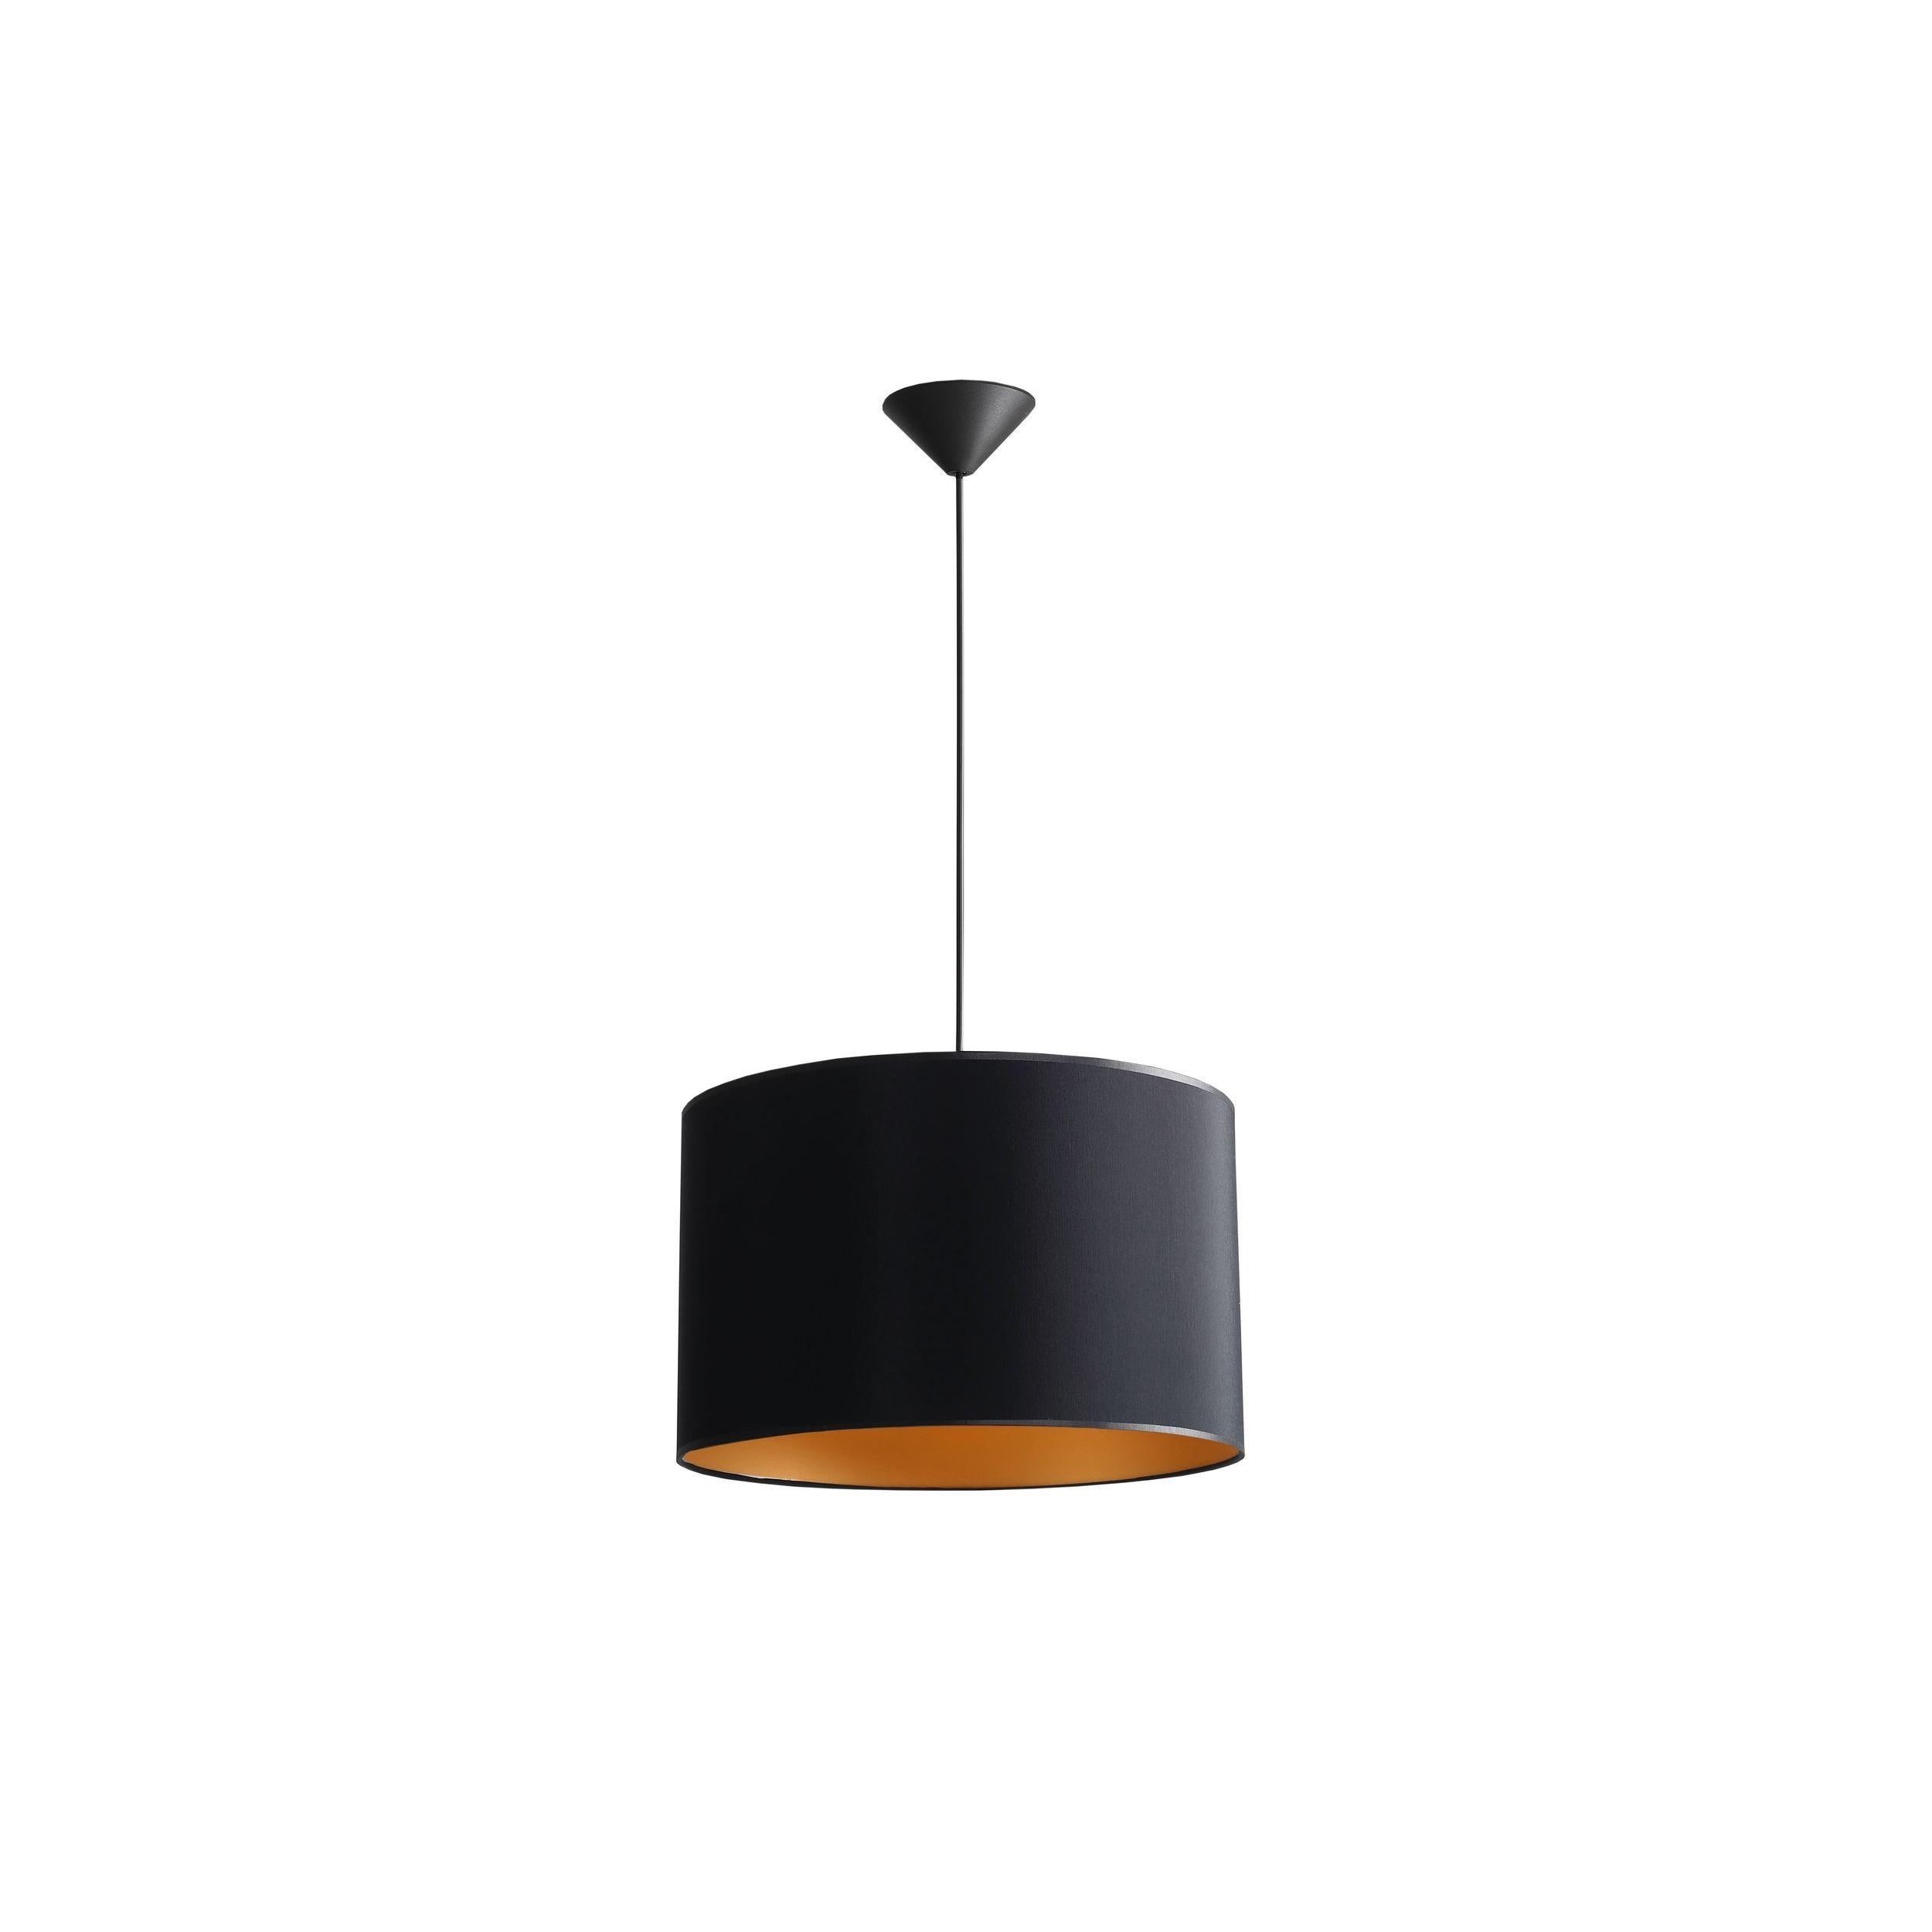 Lampa wisząca Aldex x1 Barilla Gold 953G